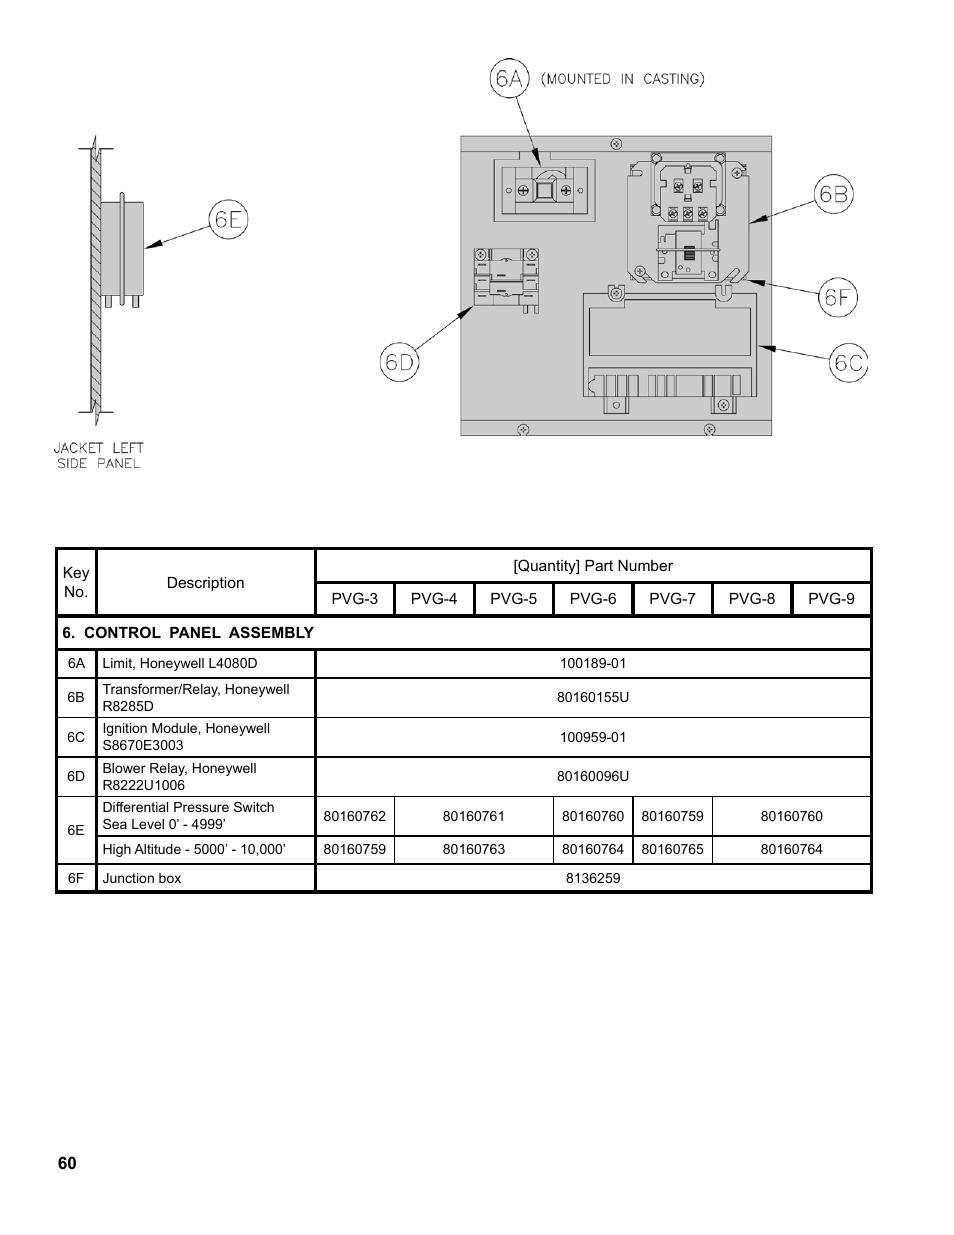 Burnham Boiler Wiring Diagram Honeywell R8222u1006 Schematics Pvg User Manual Page 60 64 Rh Manualsdir Com Steam Parts